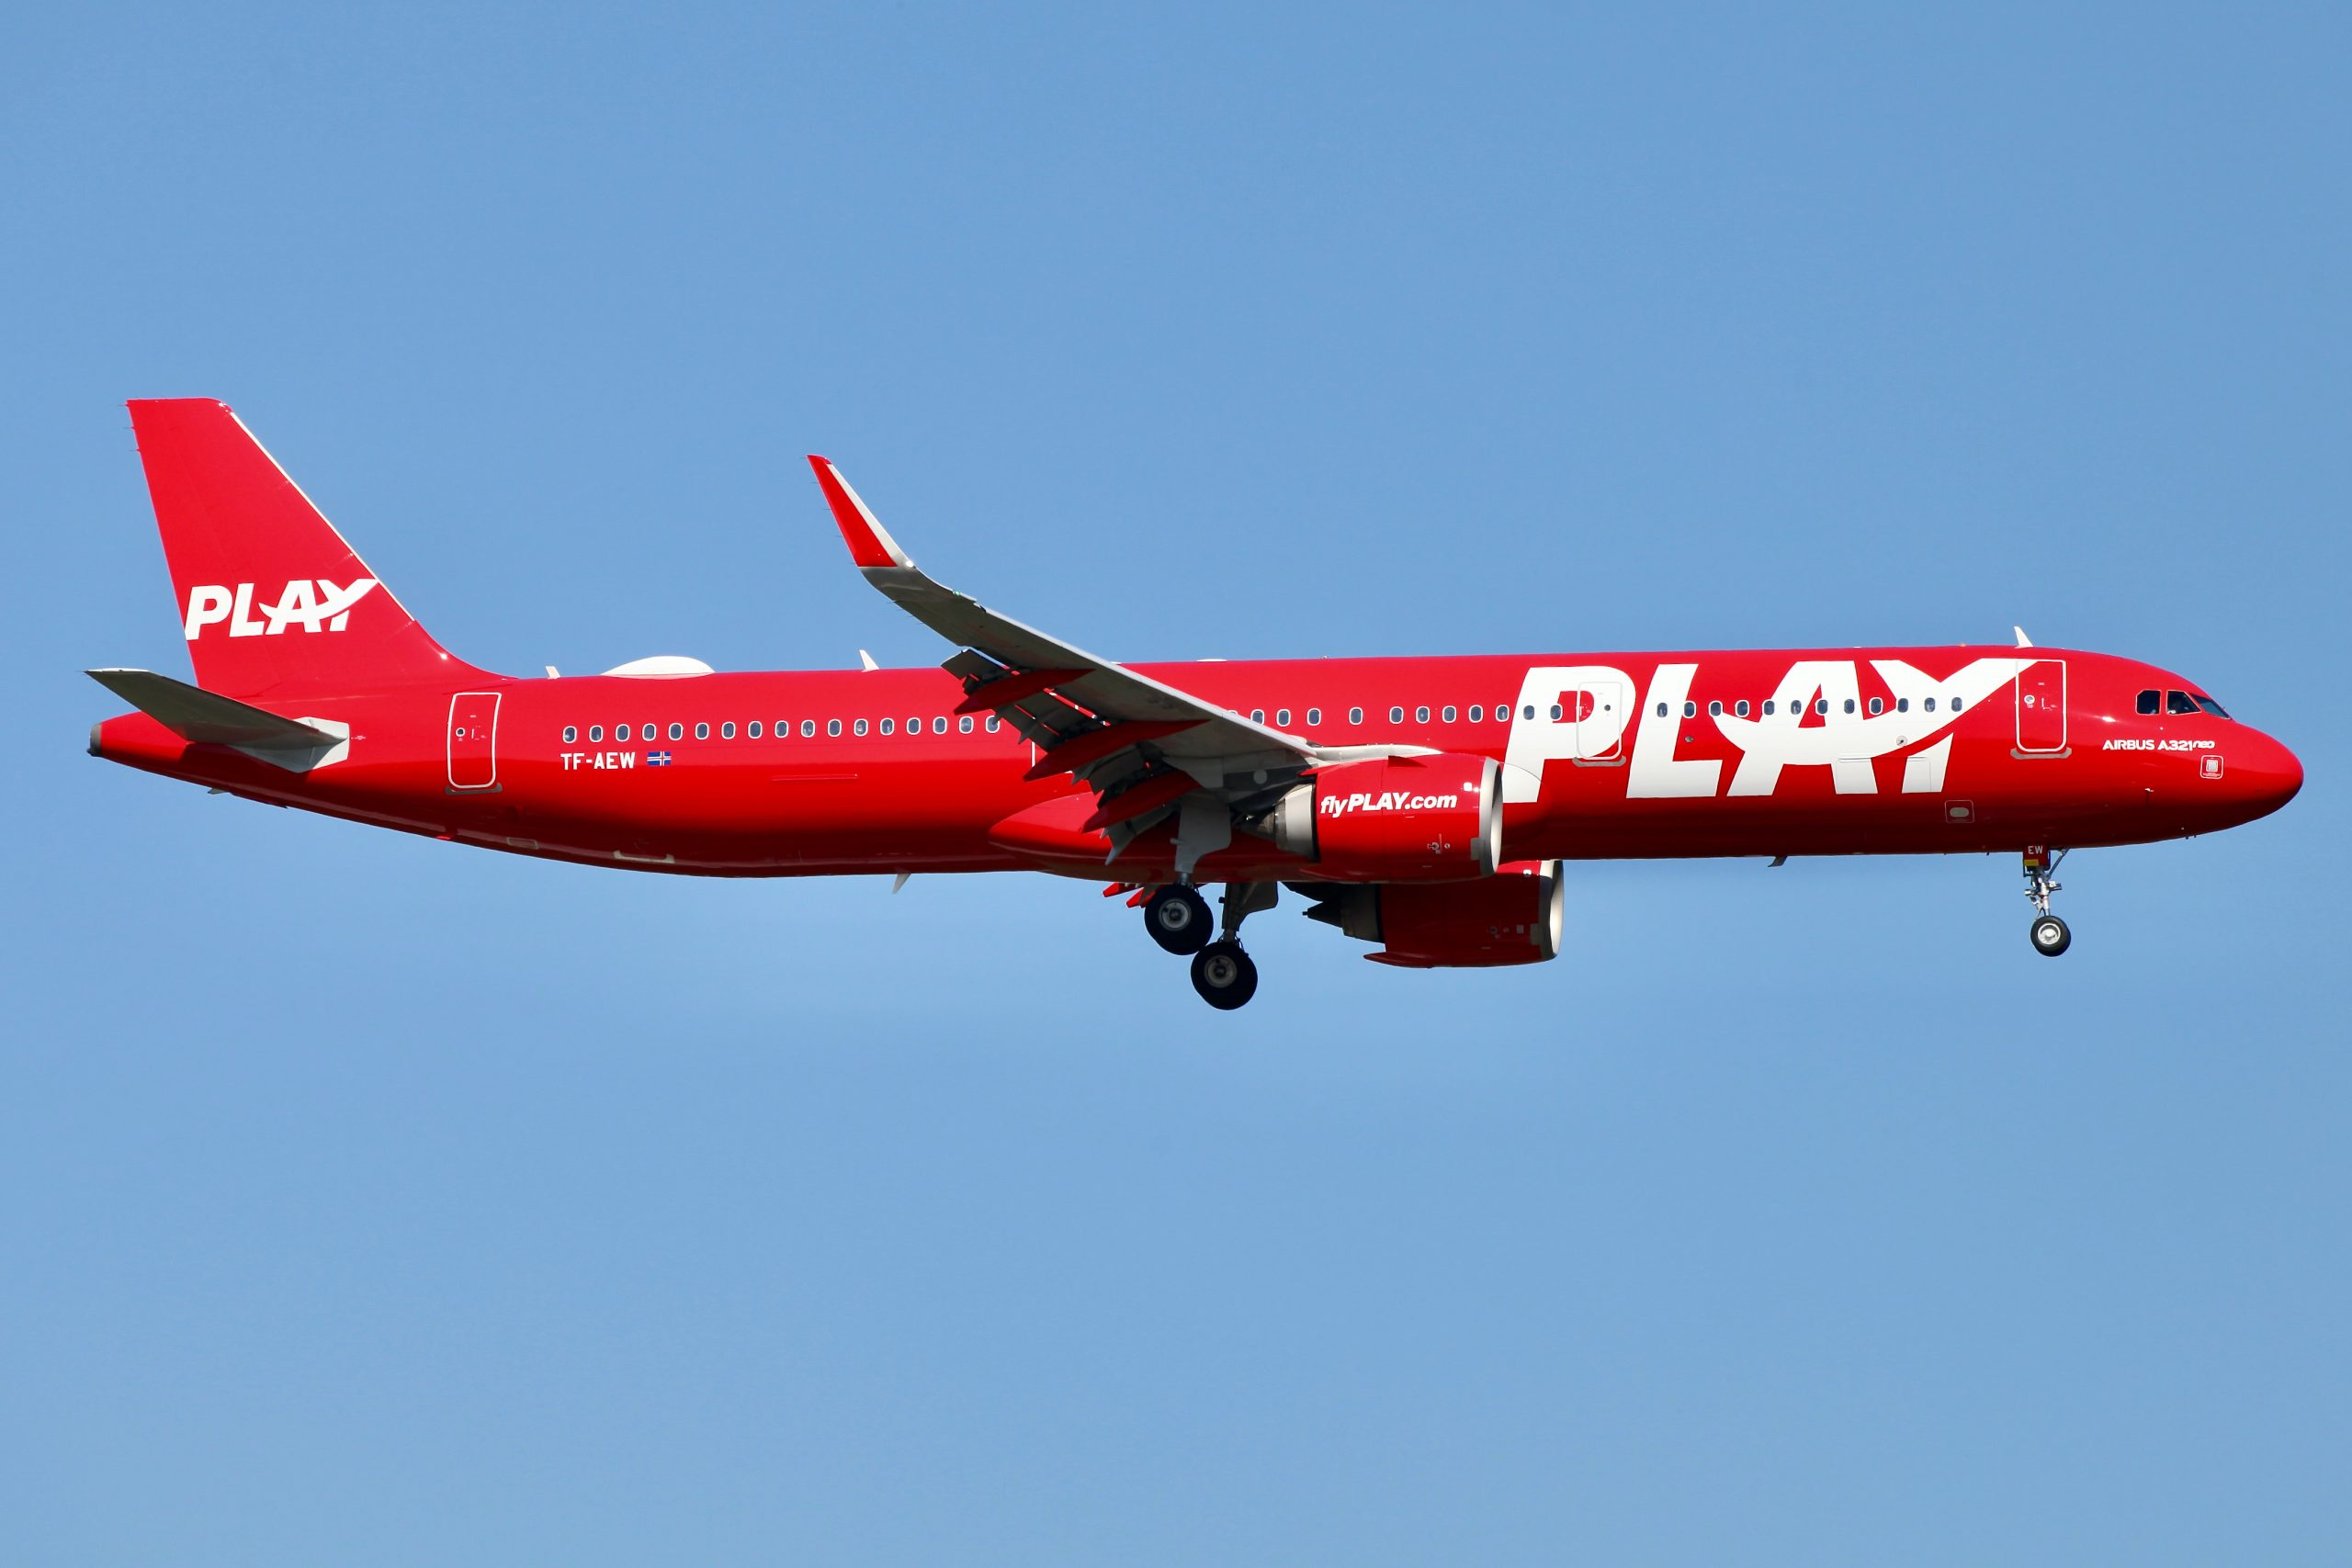 Isländische Billigfluggesellschaft Play